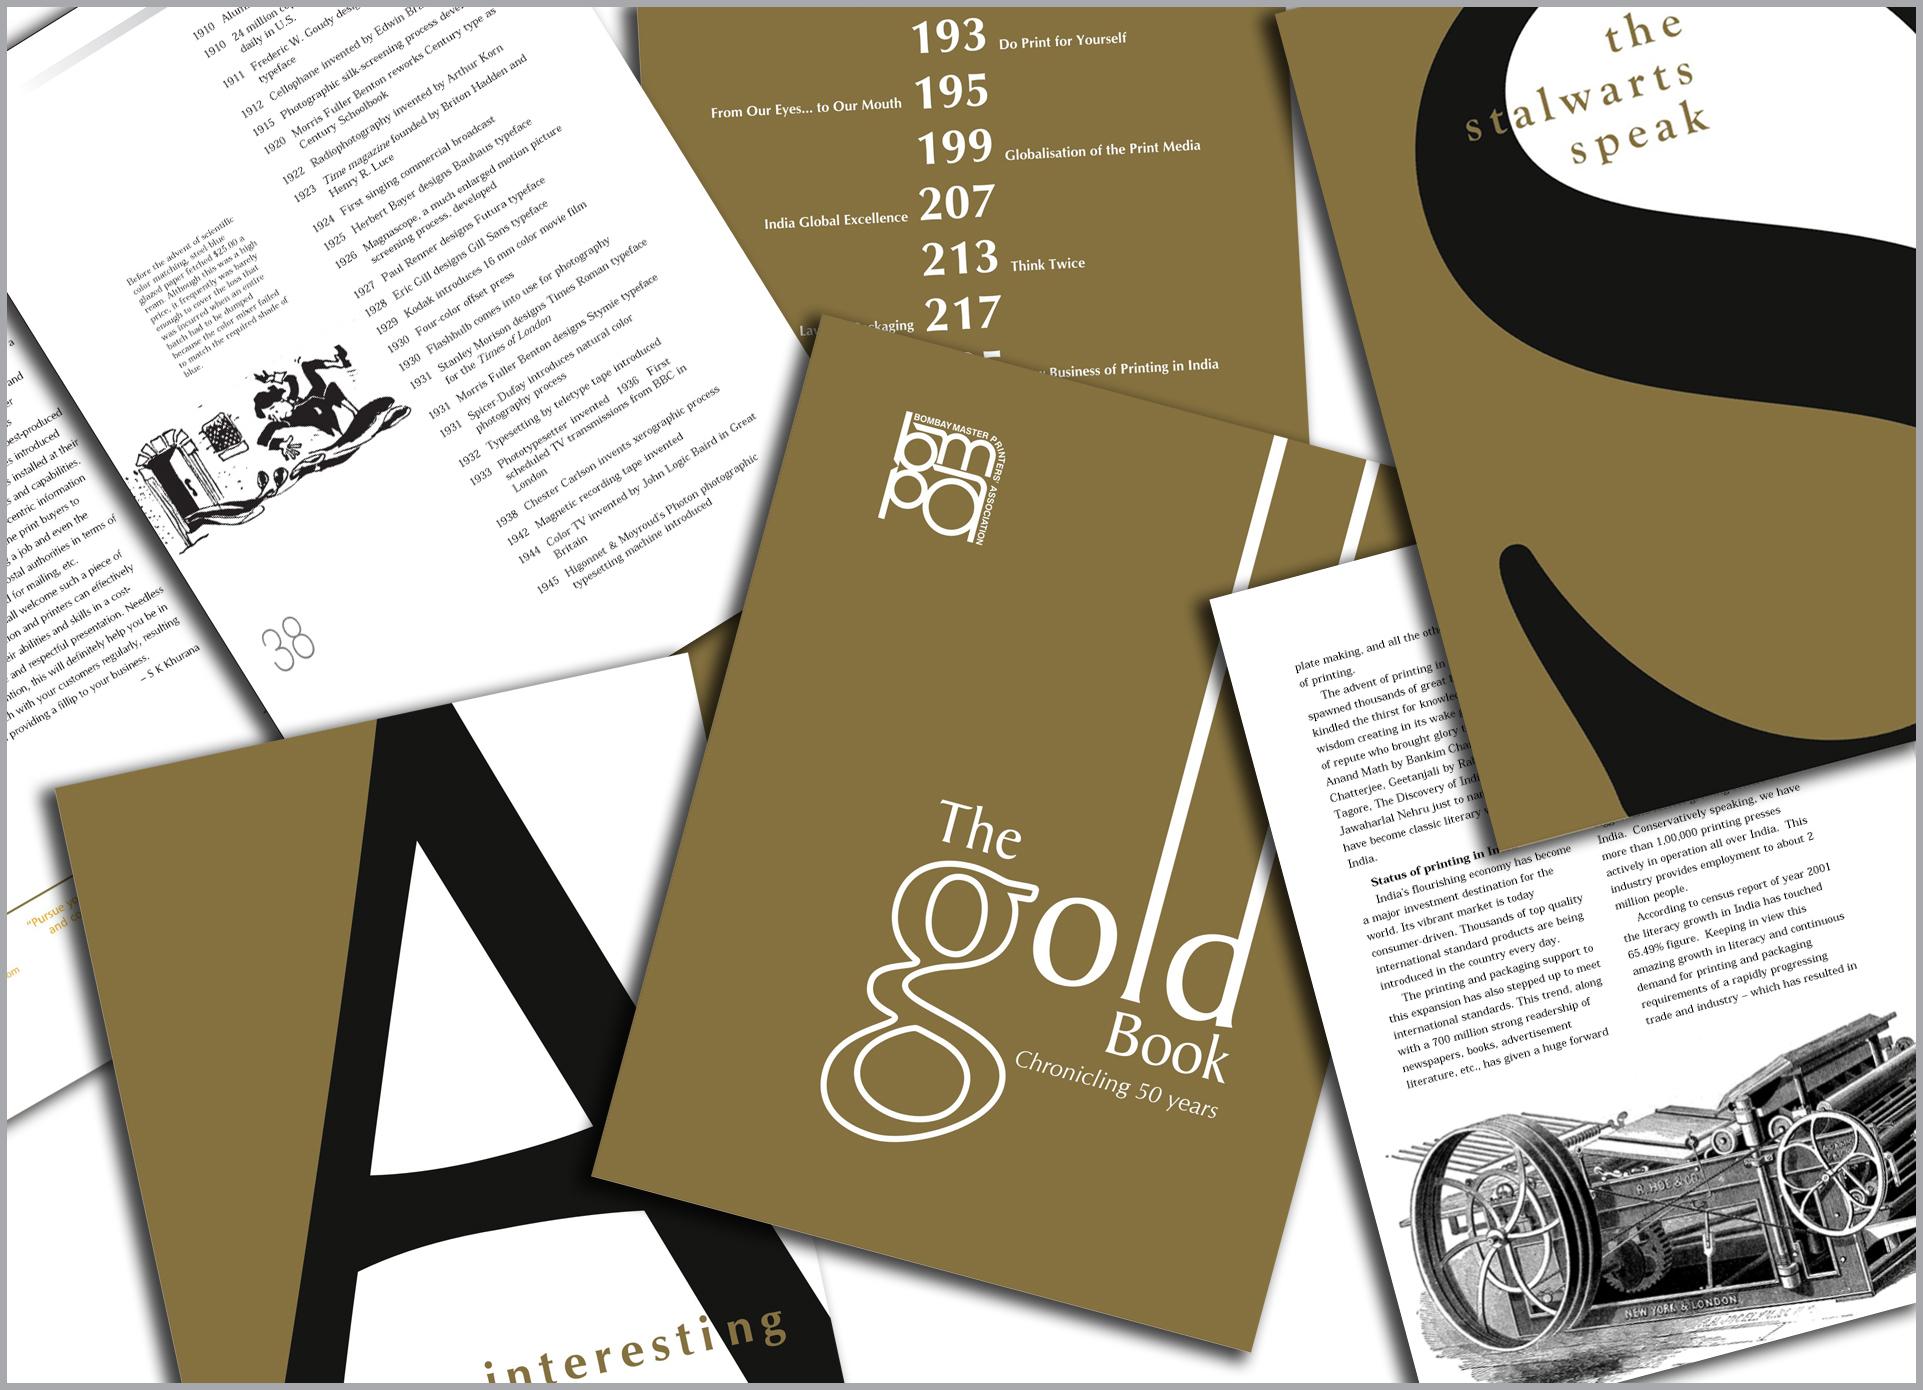 Coffee Table Book Design Ideas - Home Design Ideas